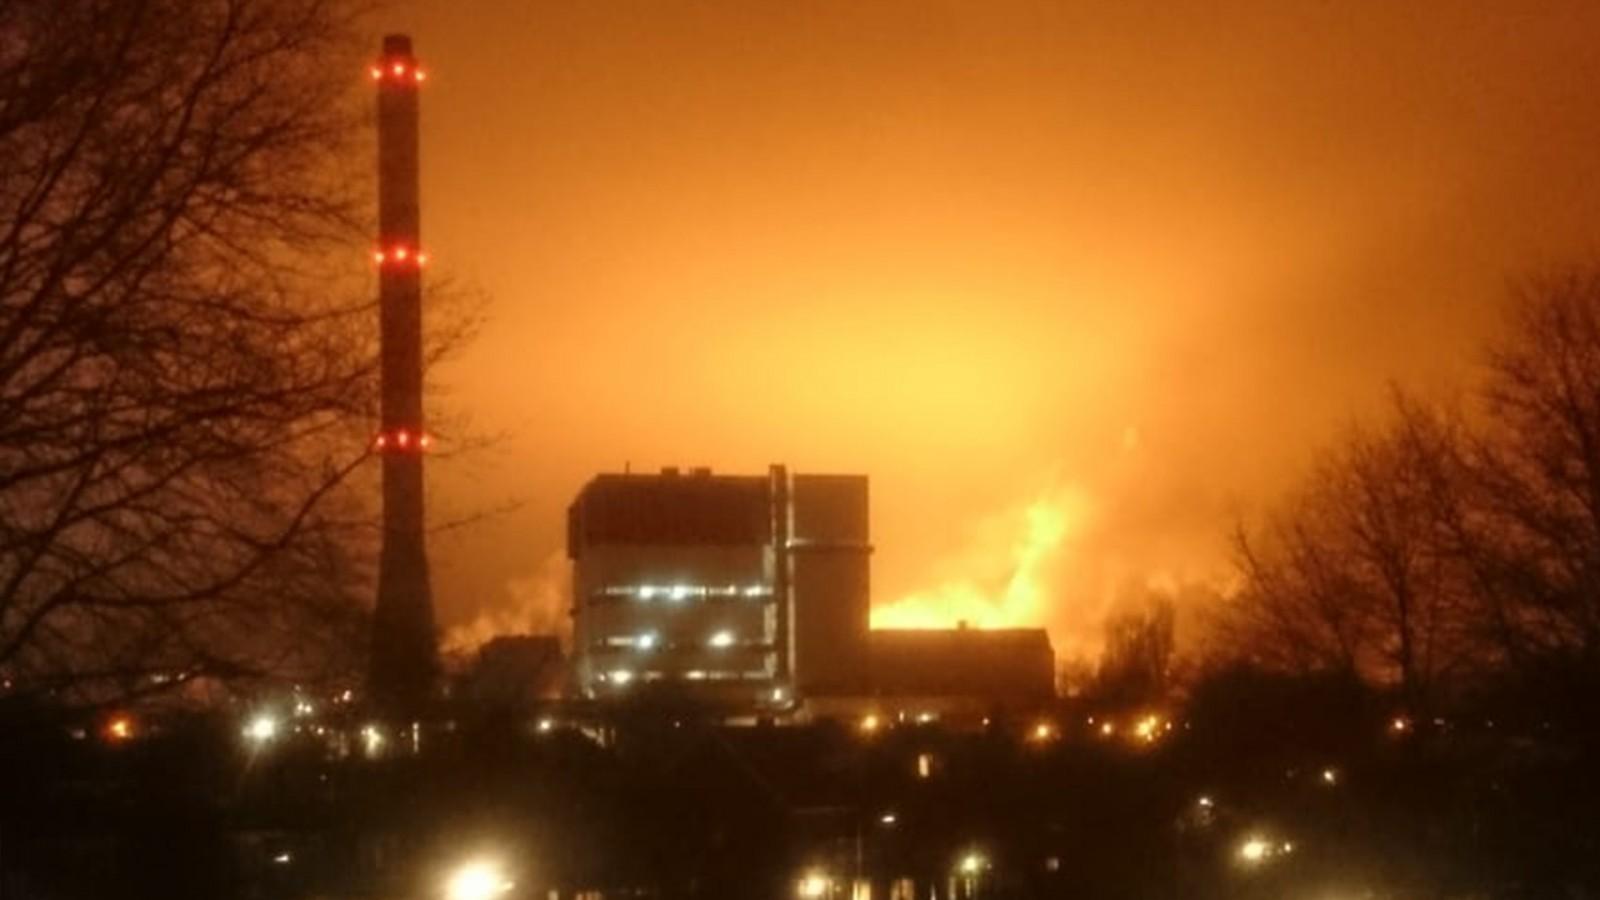 Tata Steel 'spuwt vuur' na explosie: lucht boven IJmond kleurt oranje